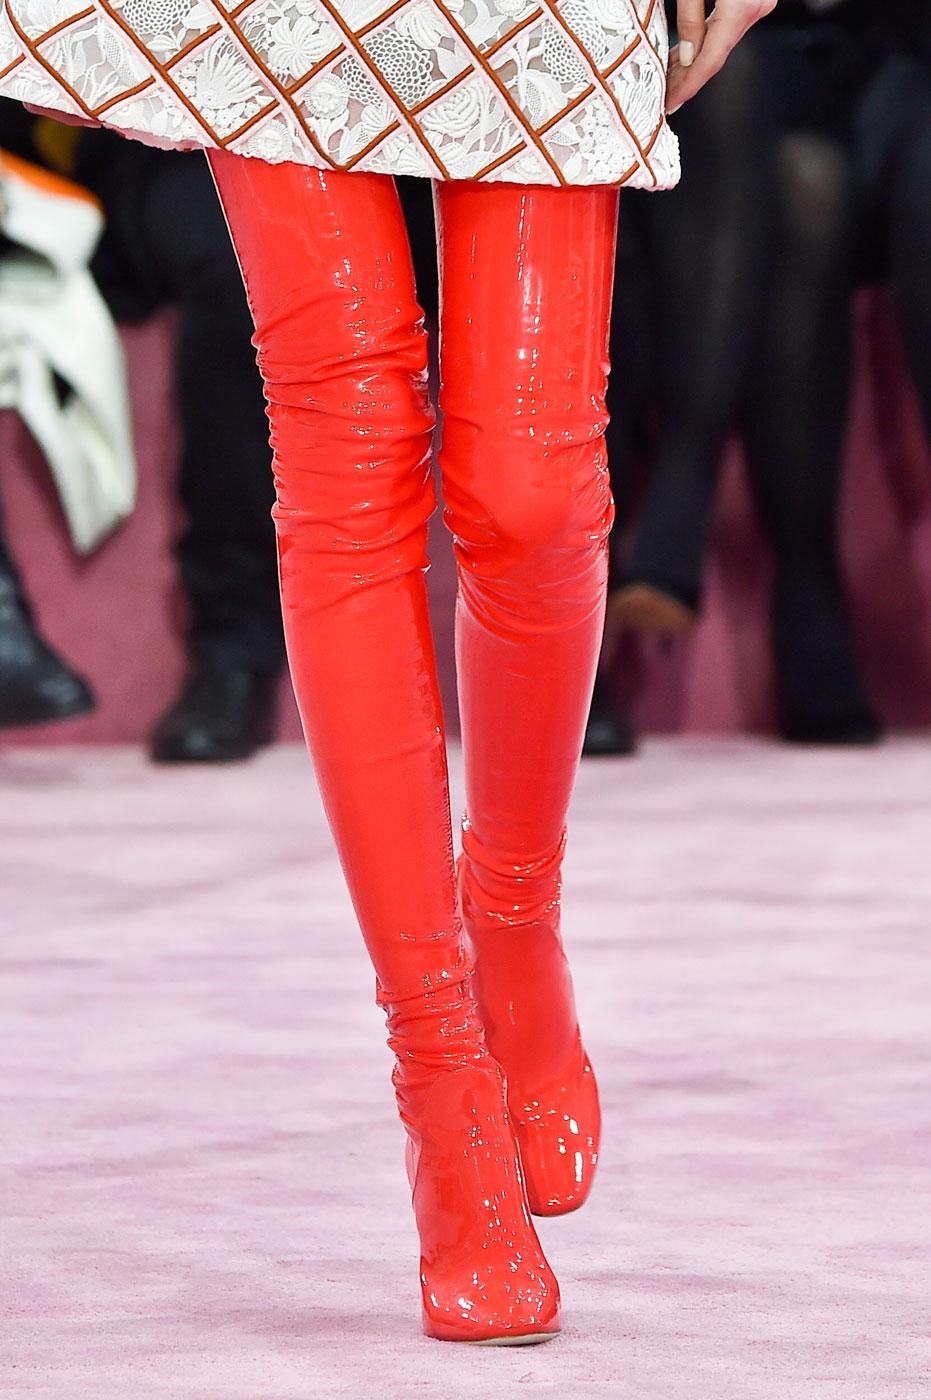 Christian-Dior-fashion-runway-show-close-ups-haute-couture-paris-spring-summer-2015-the-impression-088